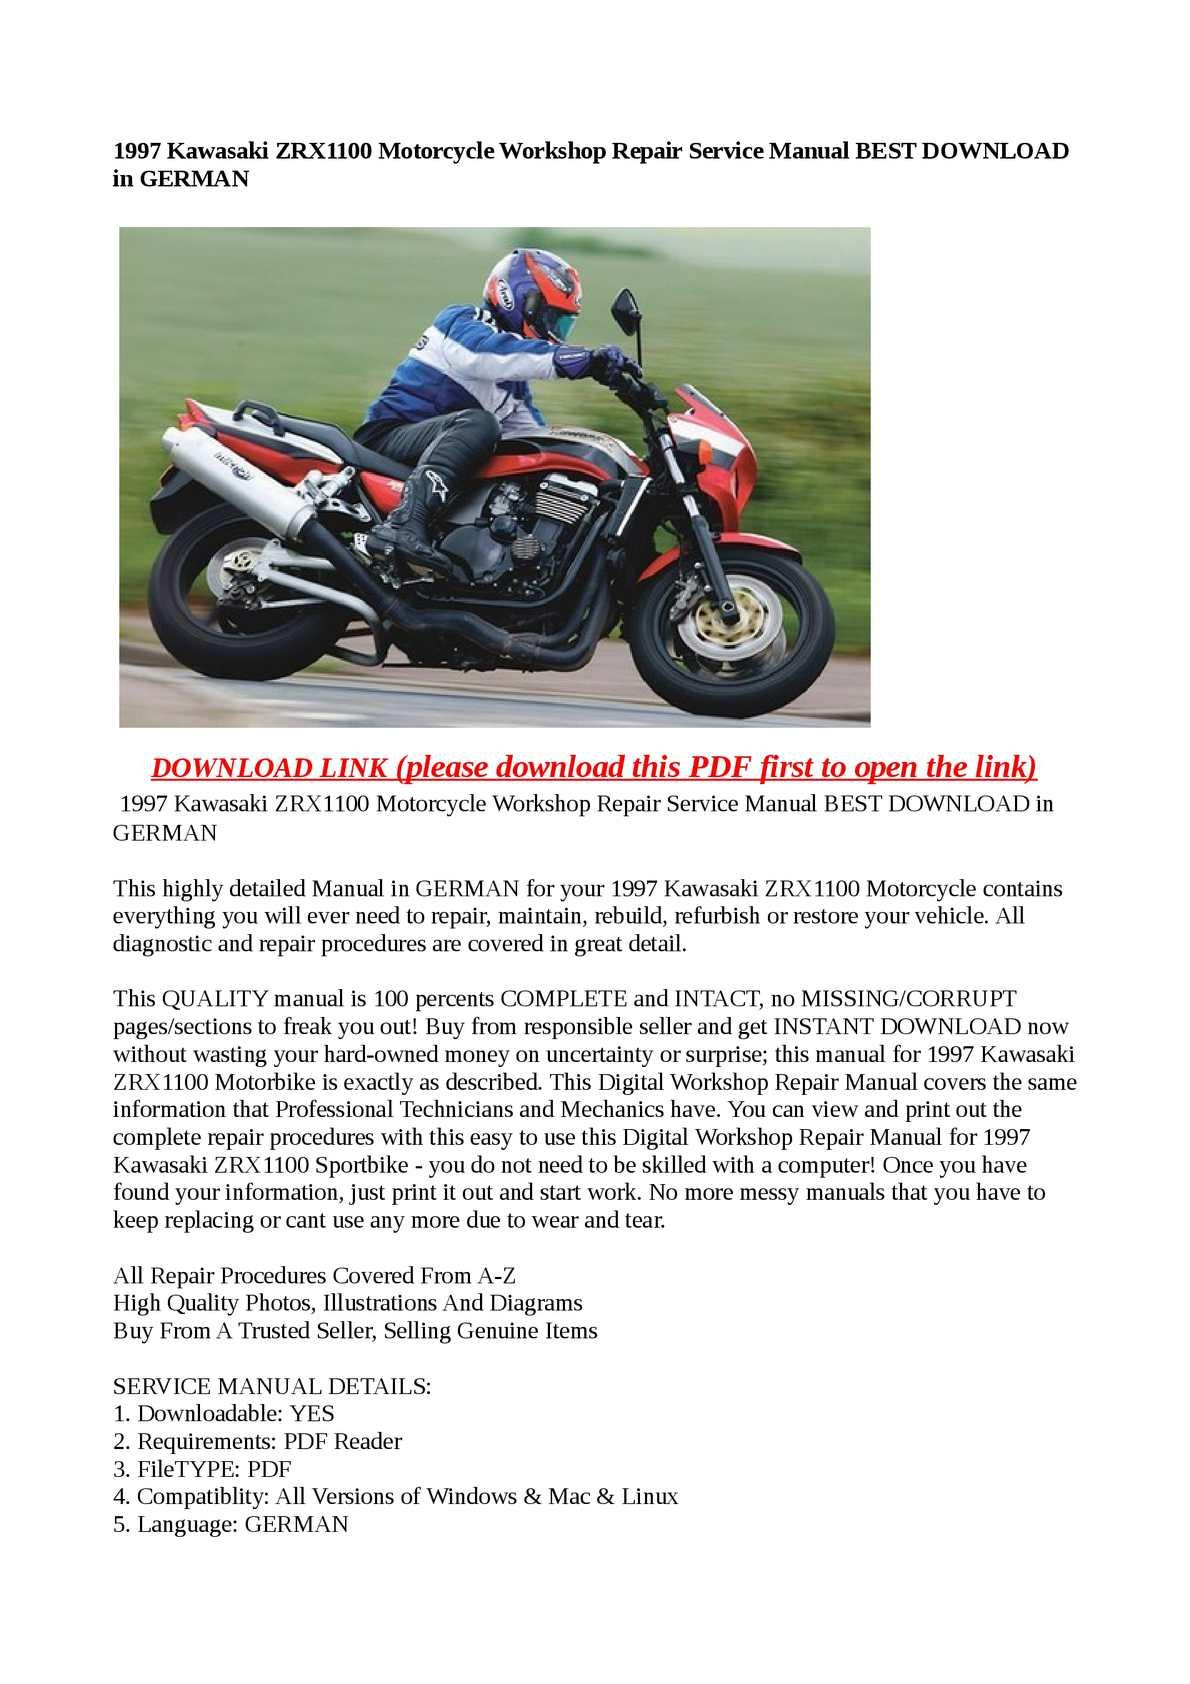 Calaméo - 1997 Kawasaki ZRX1100 Motorcycle Workshop Repair Service Manual  BEST DOWNLOAD in GERMAN